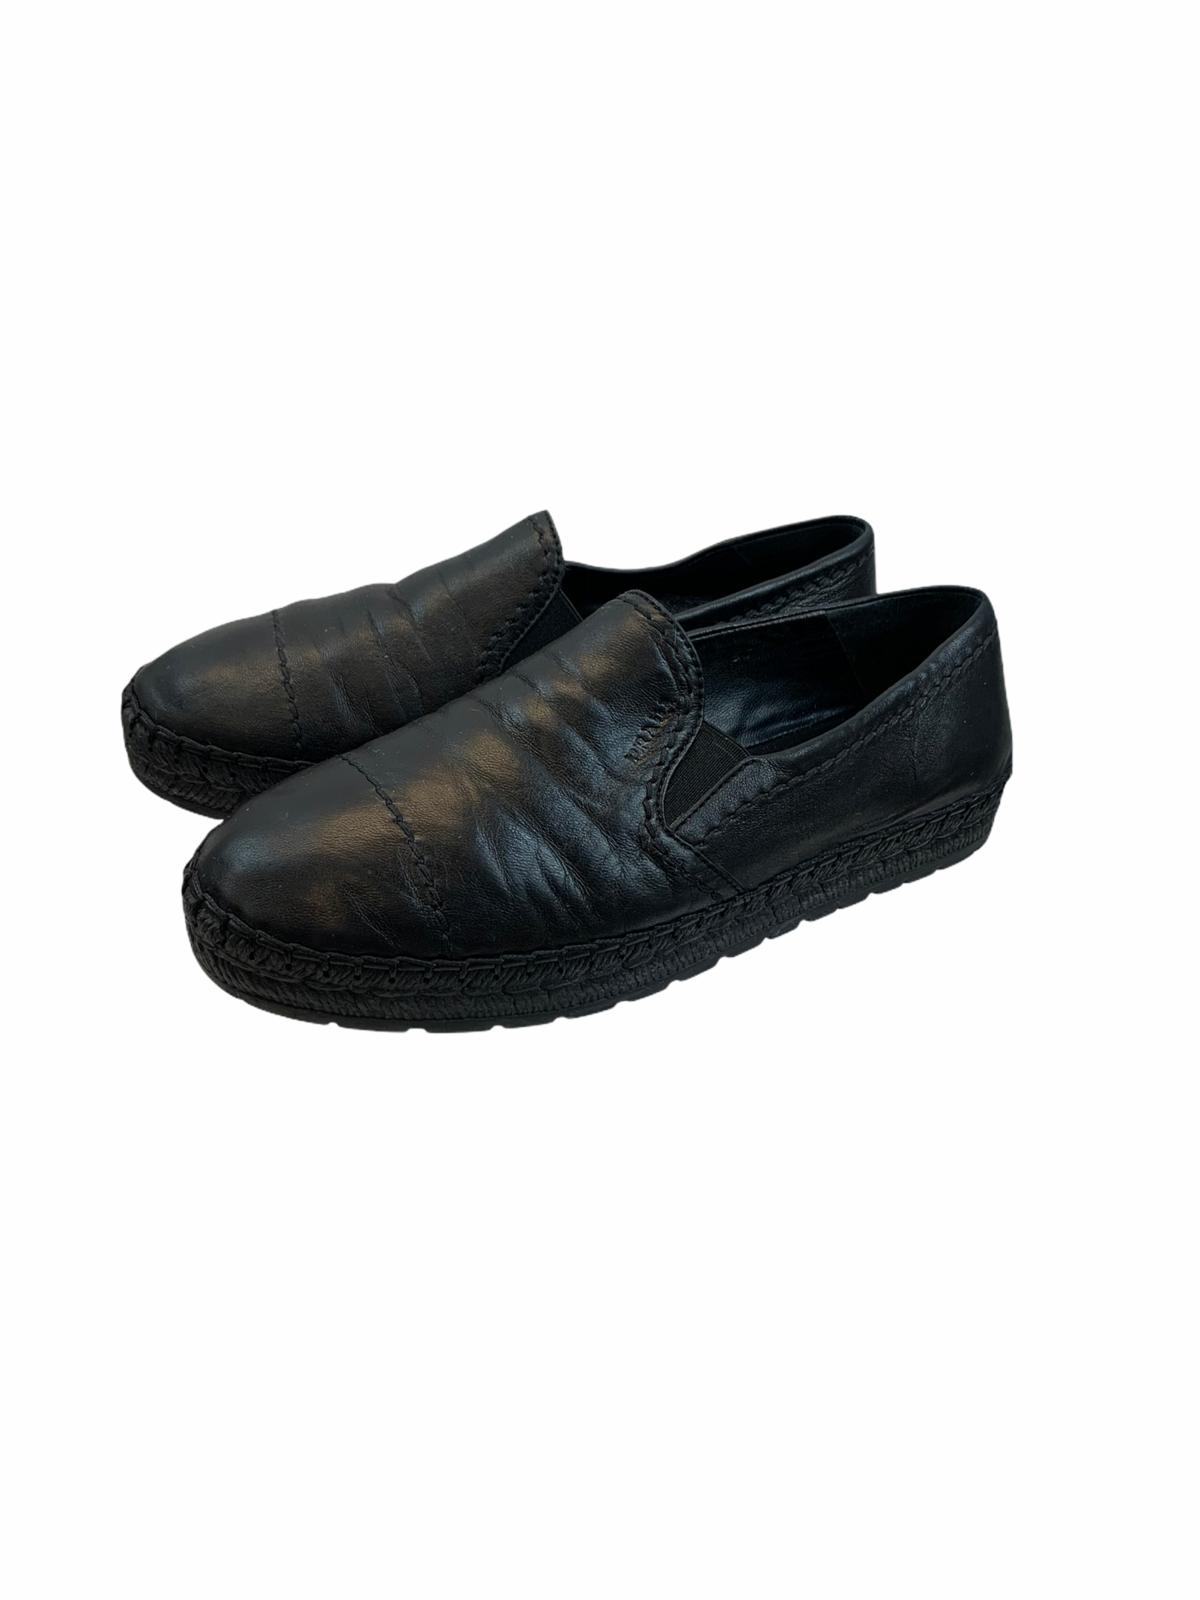 Prada Black Leather Stitch Detail Espadrilles Slip On Sneaker Womens Size 37 - $275.99